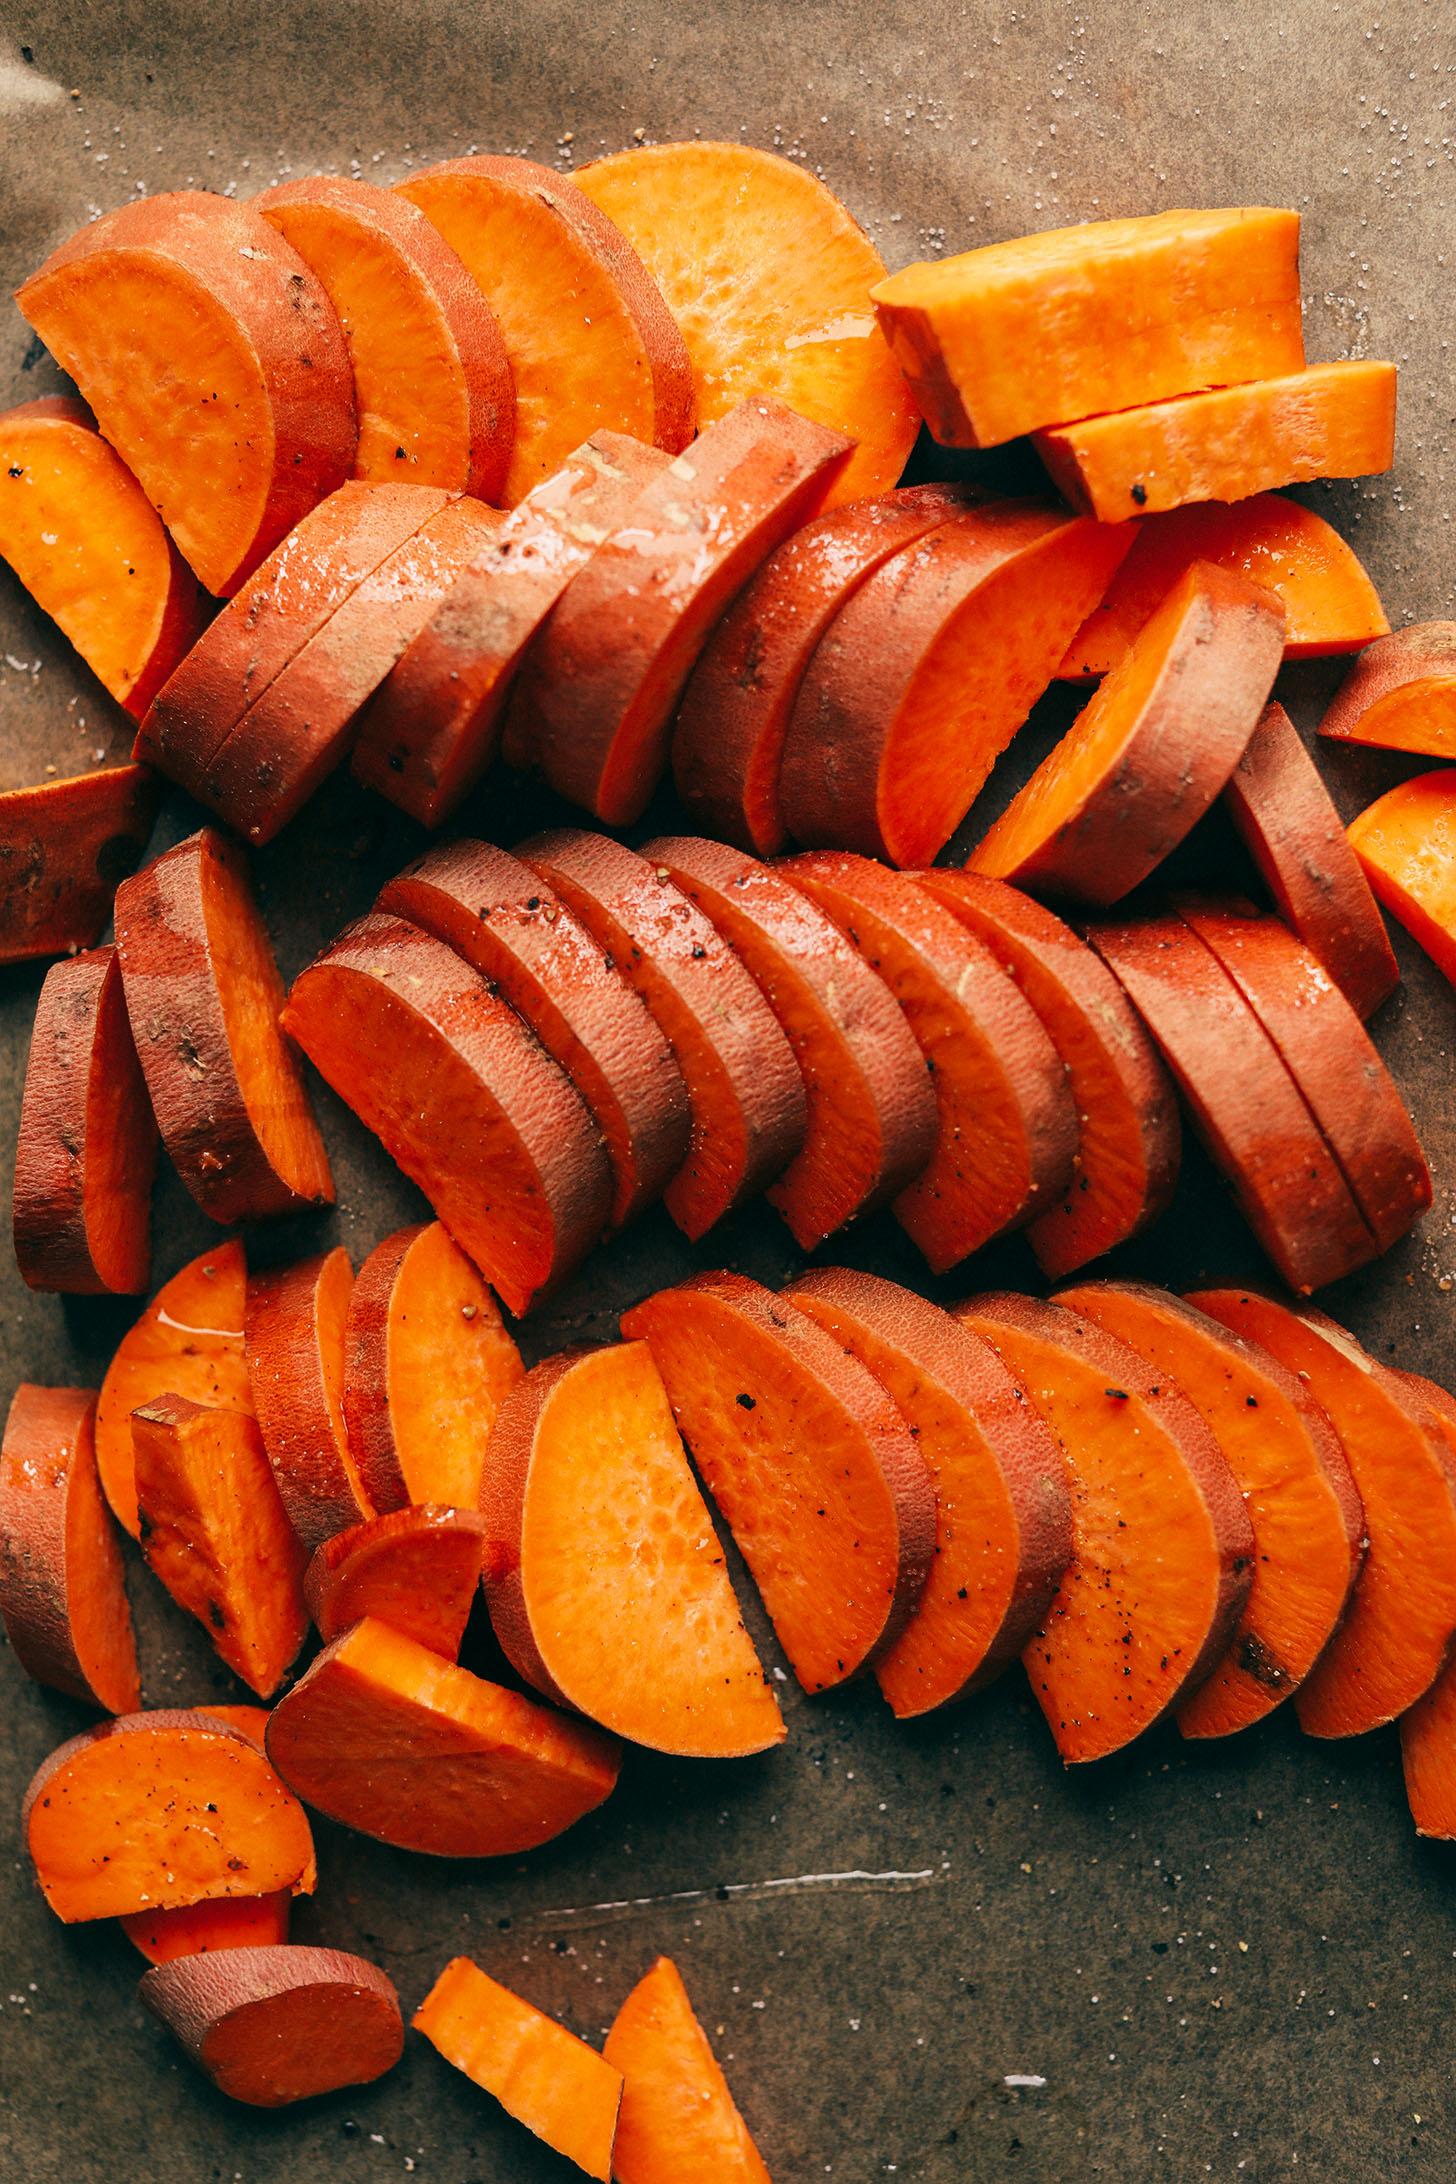 HEALTHY-Green-Salad-with-Sweet-Potatoes-Avo-and-Tahini-Dressing-30-min-9-ing-SO-delicious-vegan-glutenfree-plantbased-salad-recipe-sweetpotato.jpg